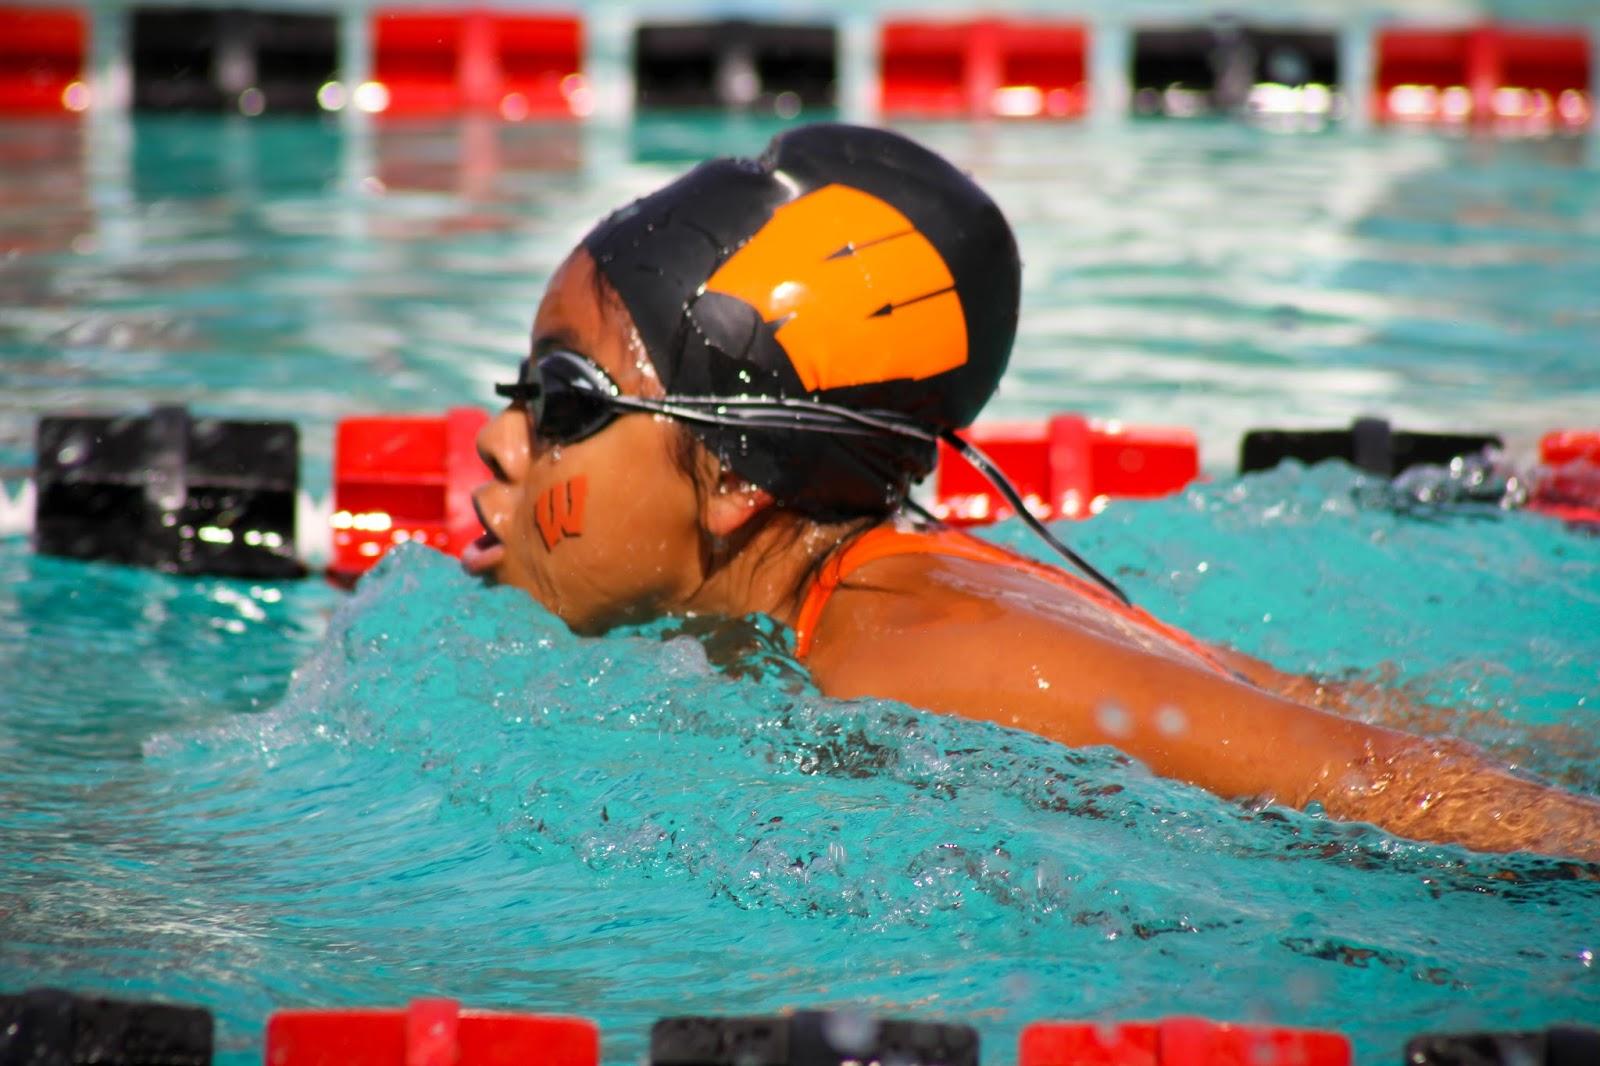 ernestown swim meet live results